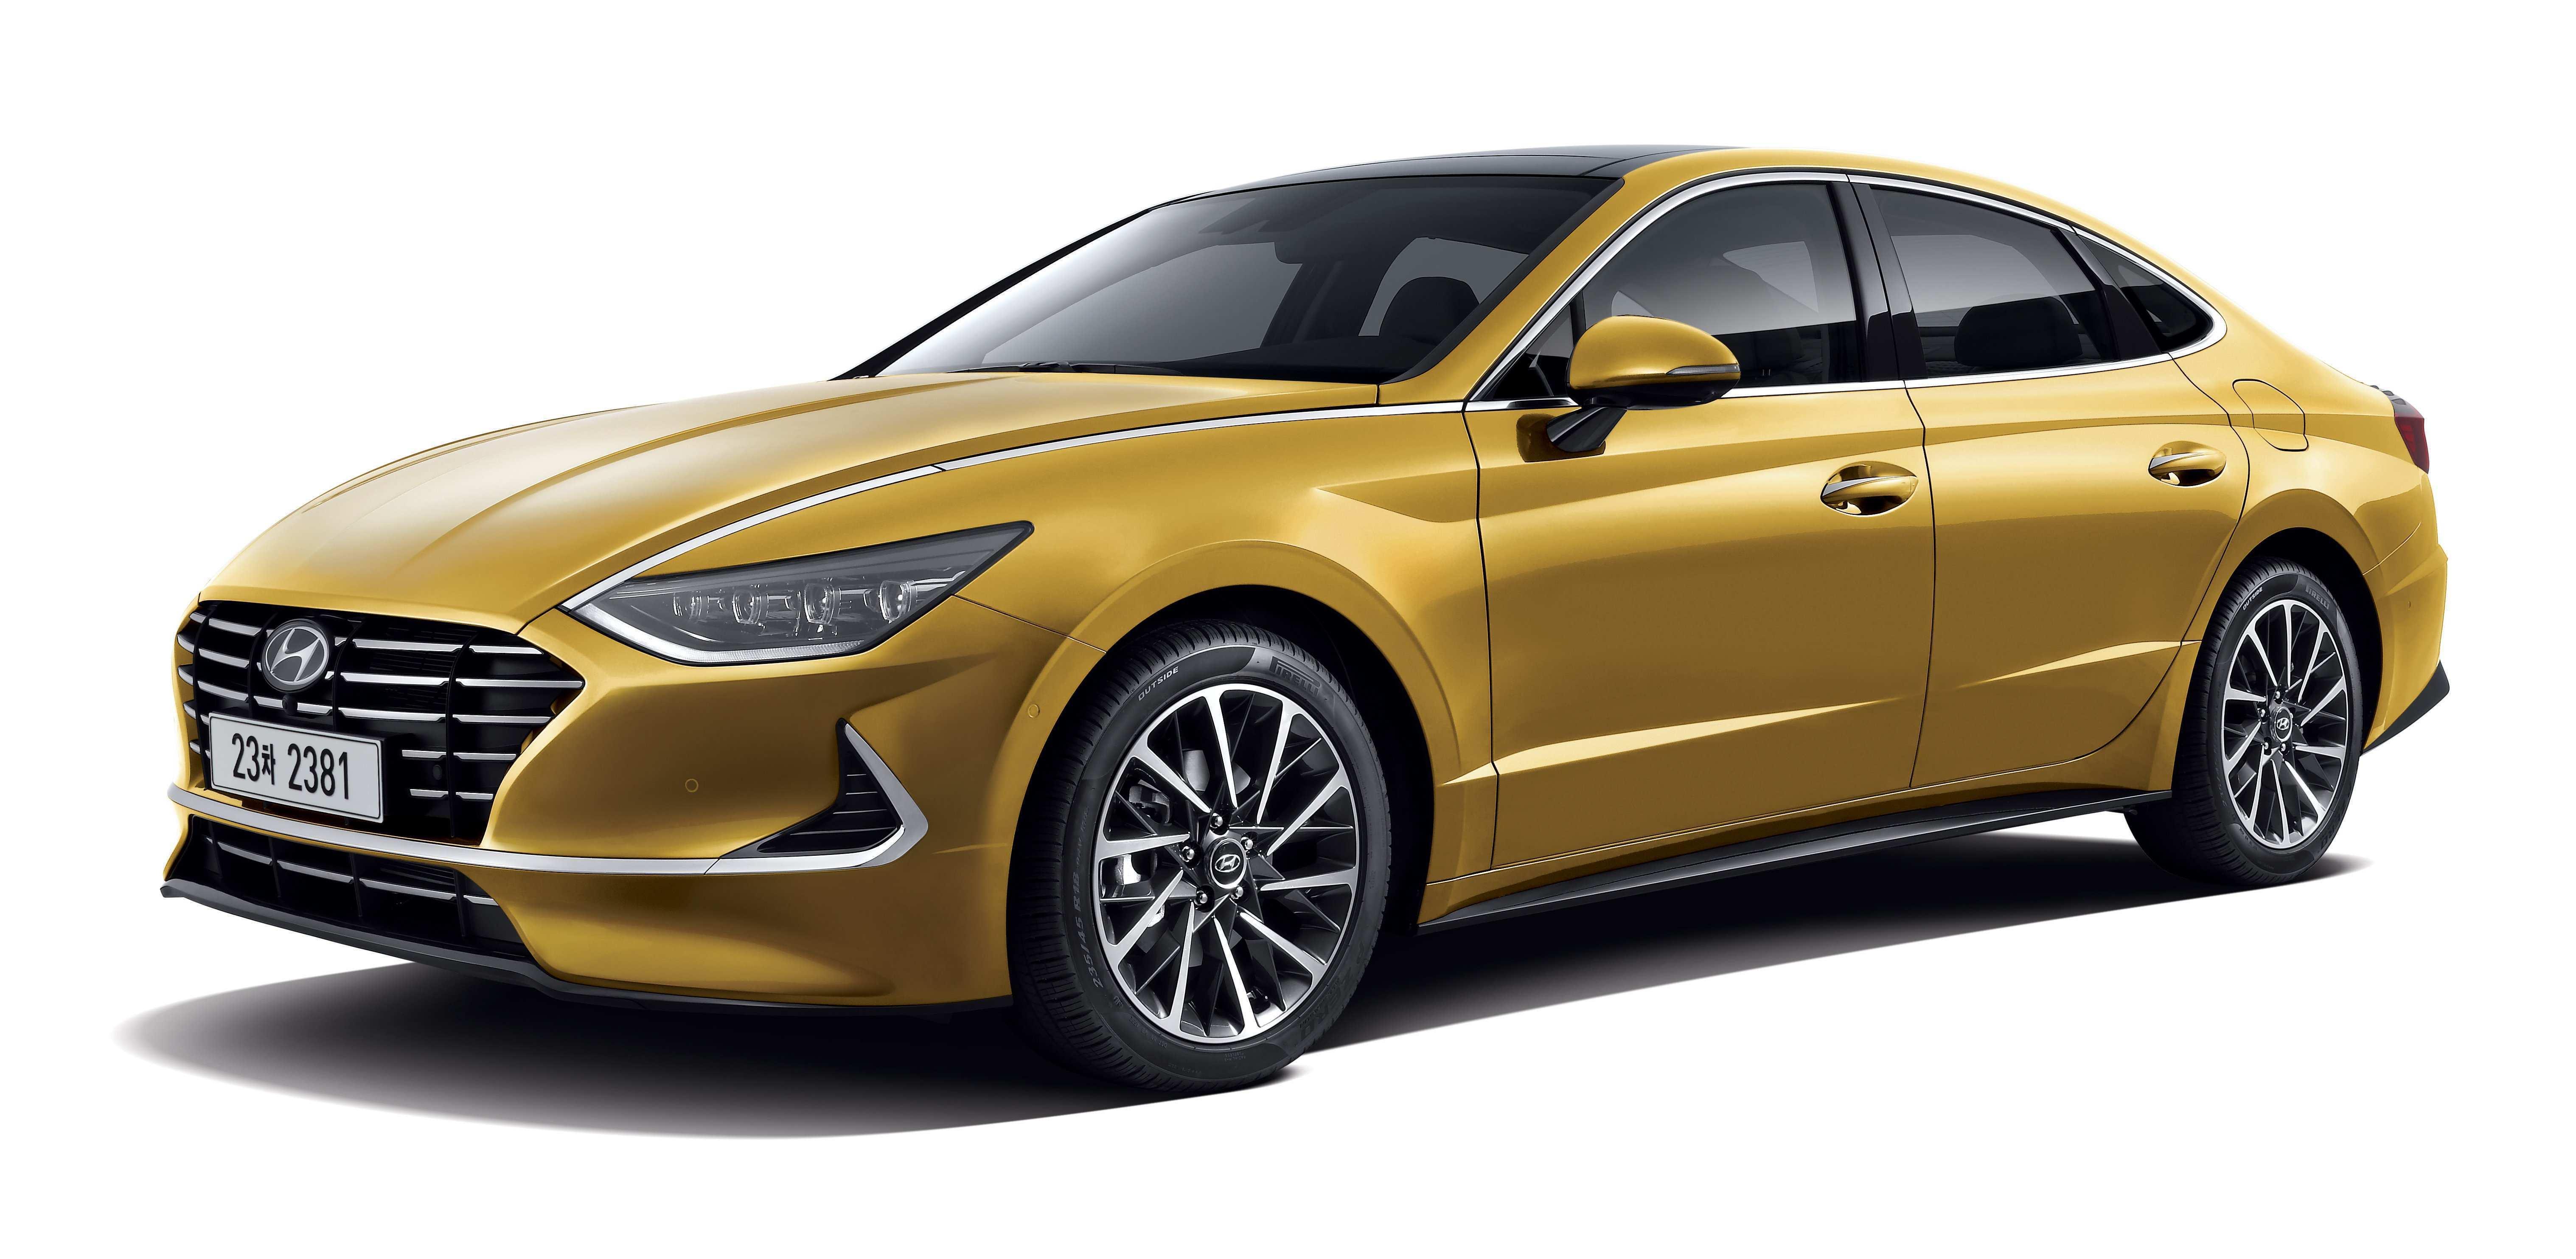 47 New 2020 Hyundai Sonata N Line Exterior with 2020 Hyundai Sonata N Line